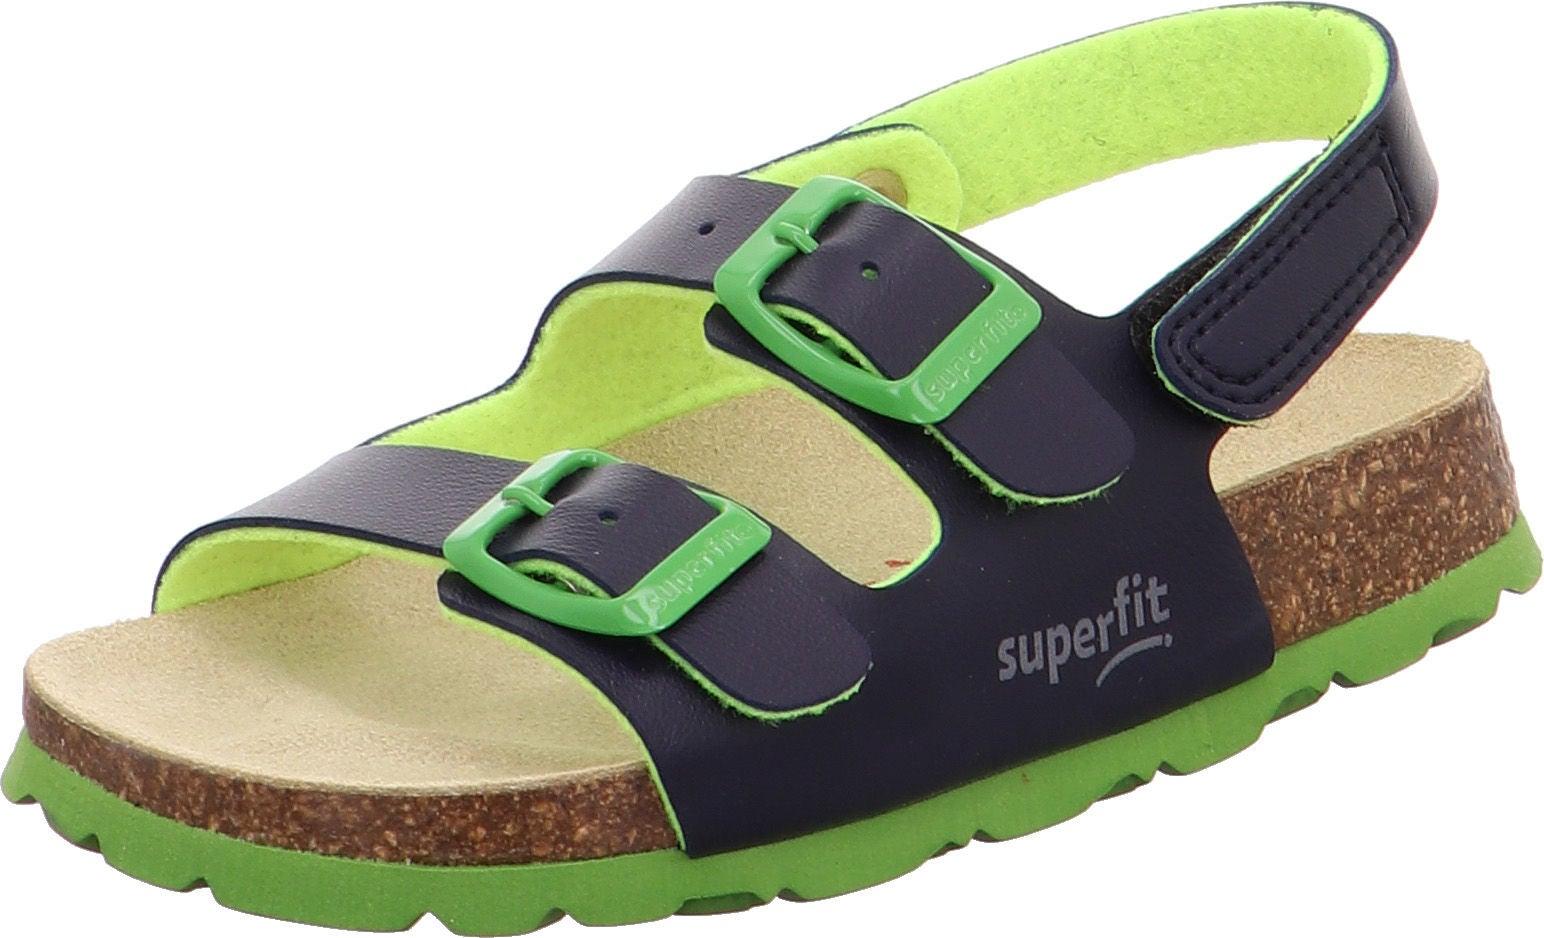 Superfit Fussbett Toffla, Blue, 25